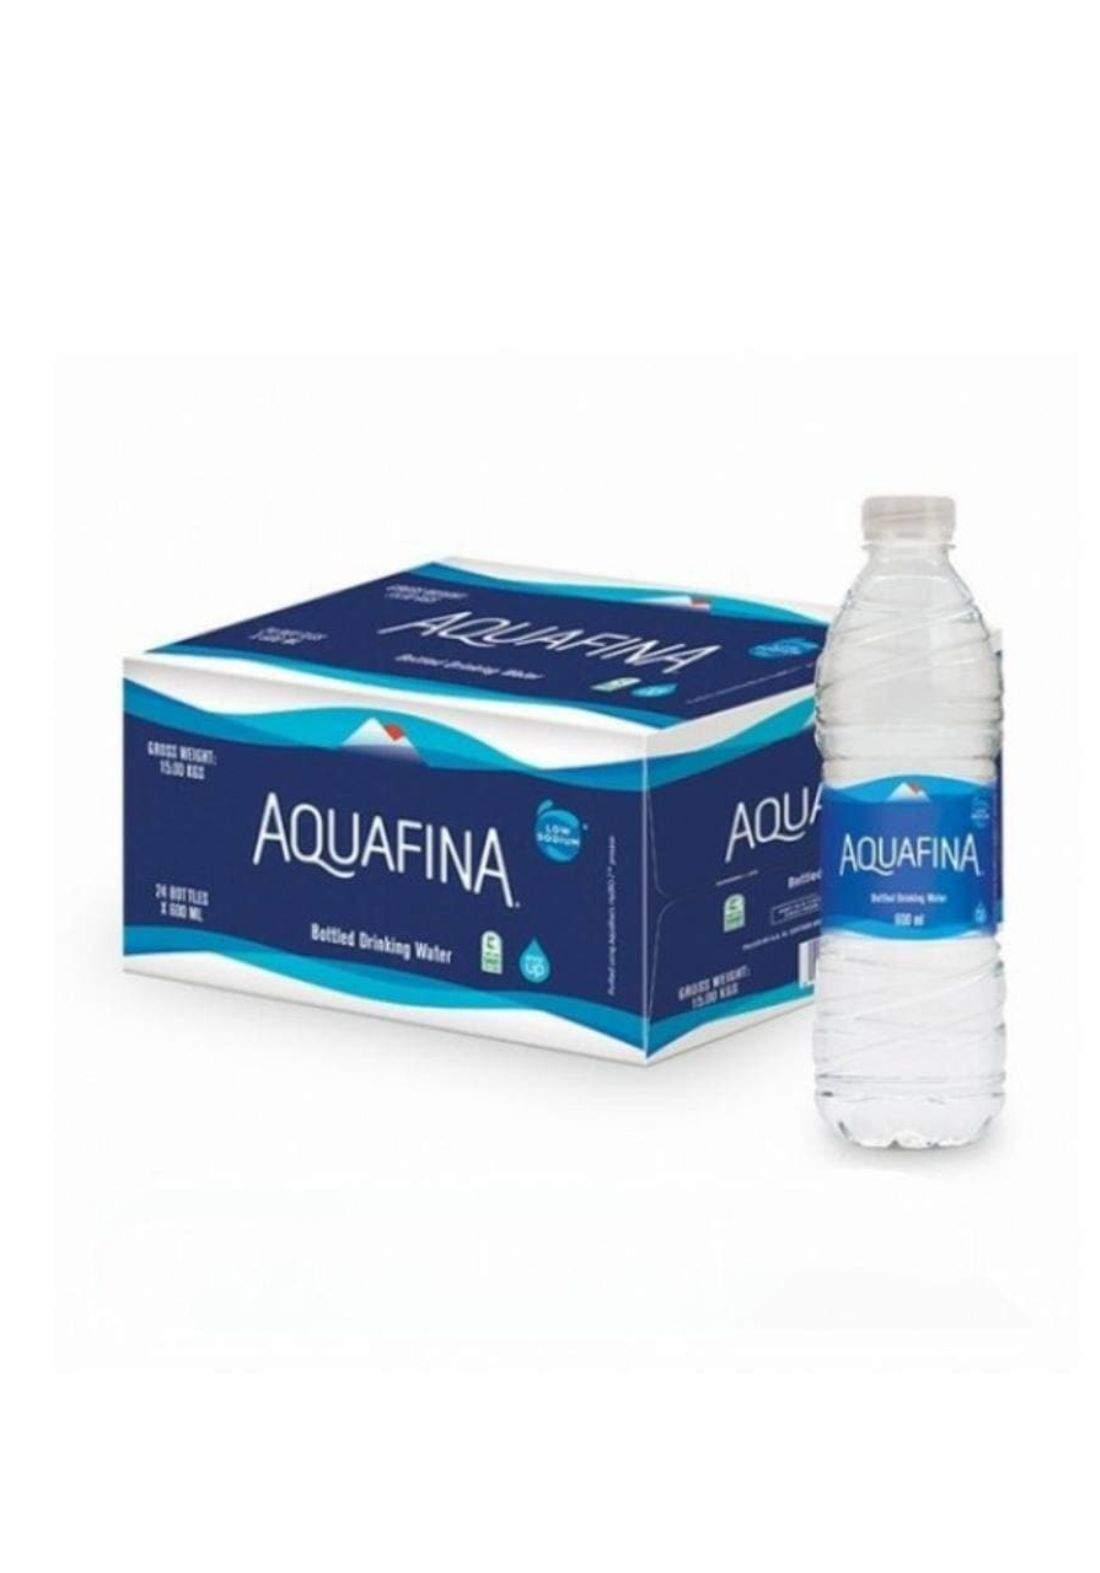 Water bottles 500ml X12 مياه اكوافينا